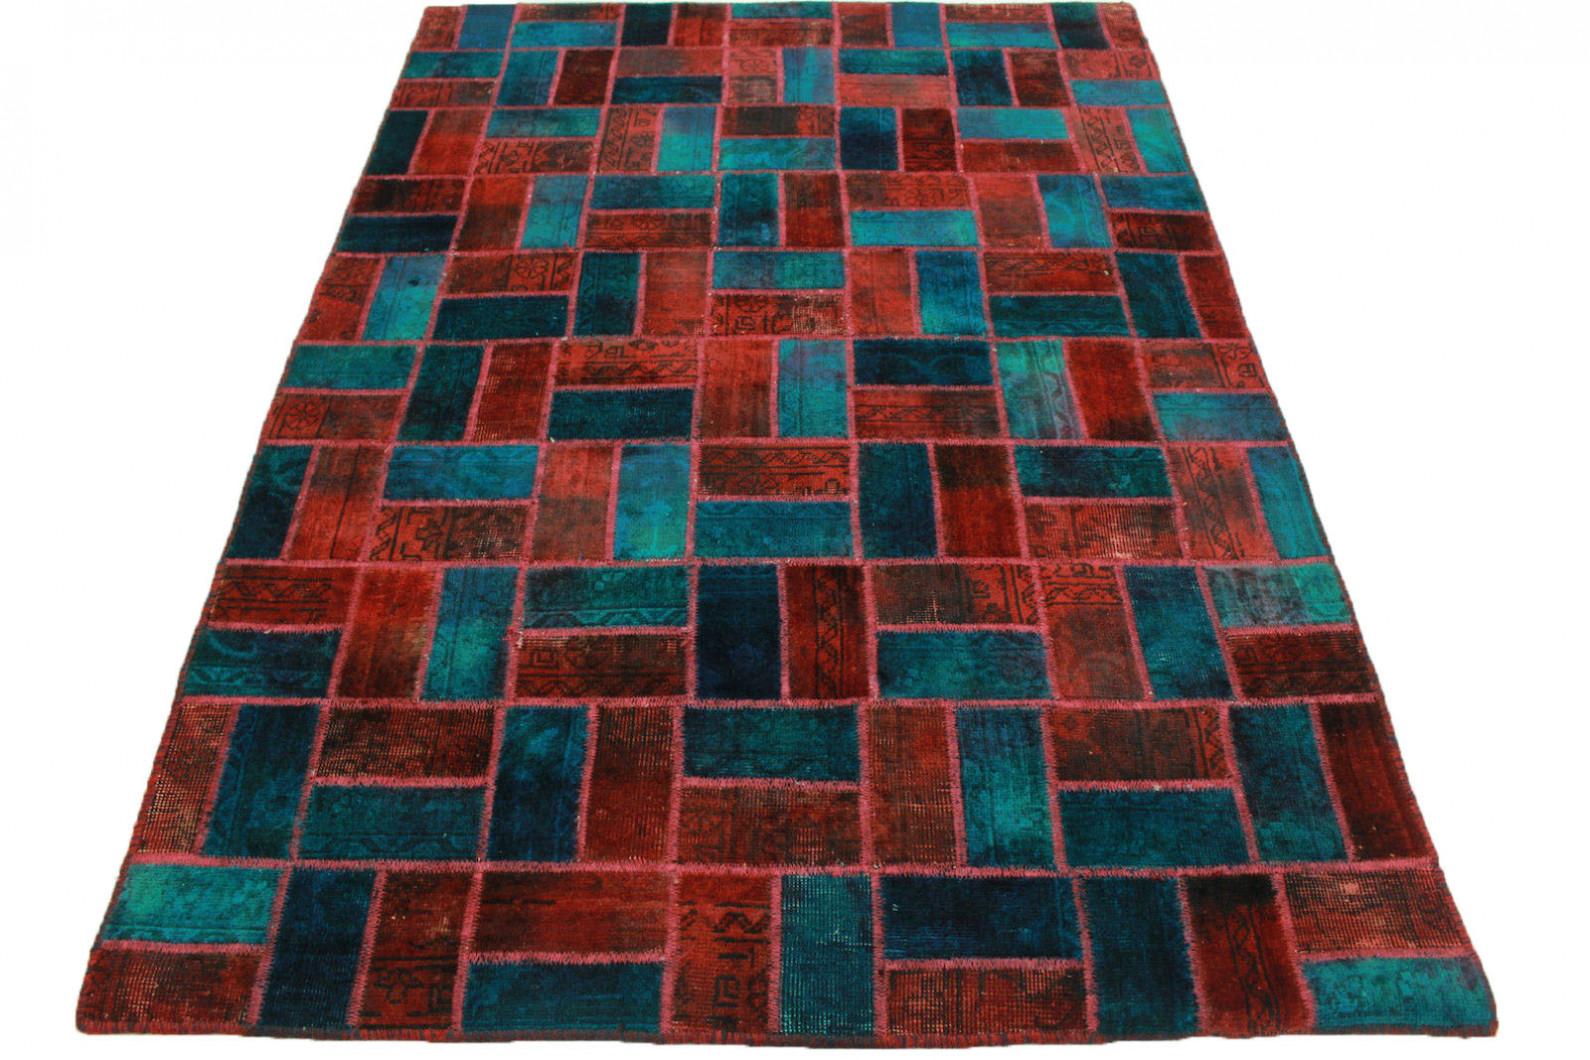 patchwork rug red turquoise in 200x140cm 1001 1913. Black Bedroom Furniture Sets. Home Design Ideas